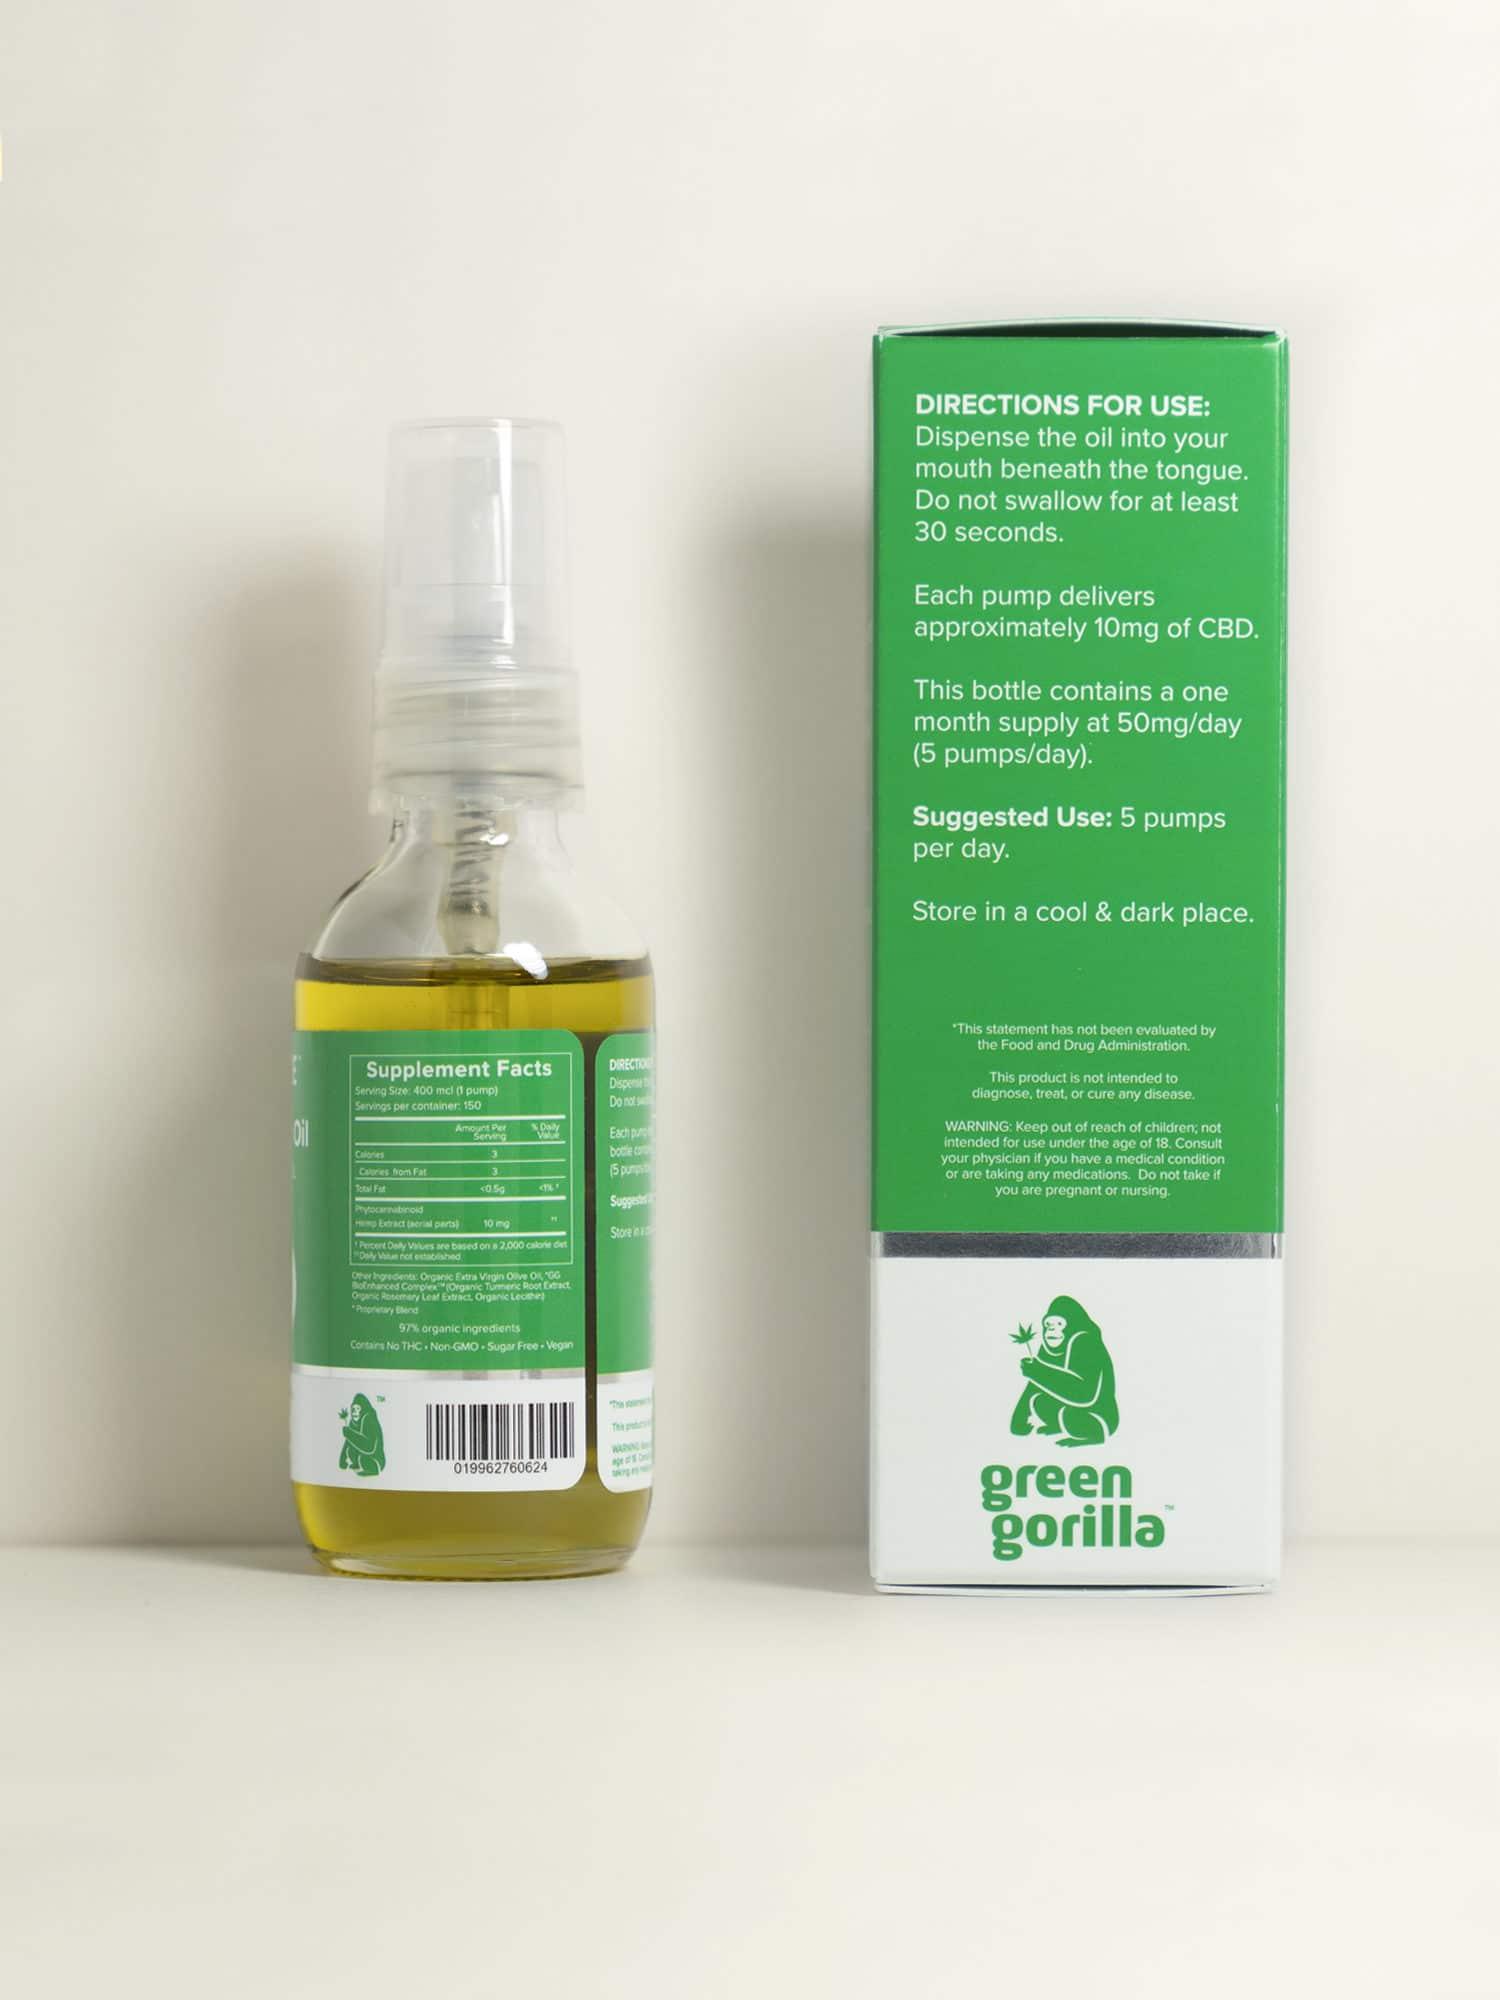 Buy USDA Certified Organic Pure Cannabidiol Oil - 1500 mg